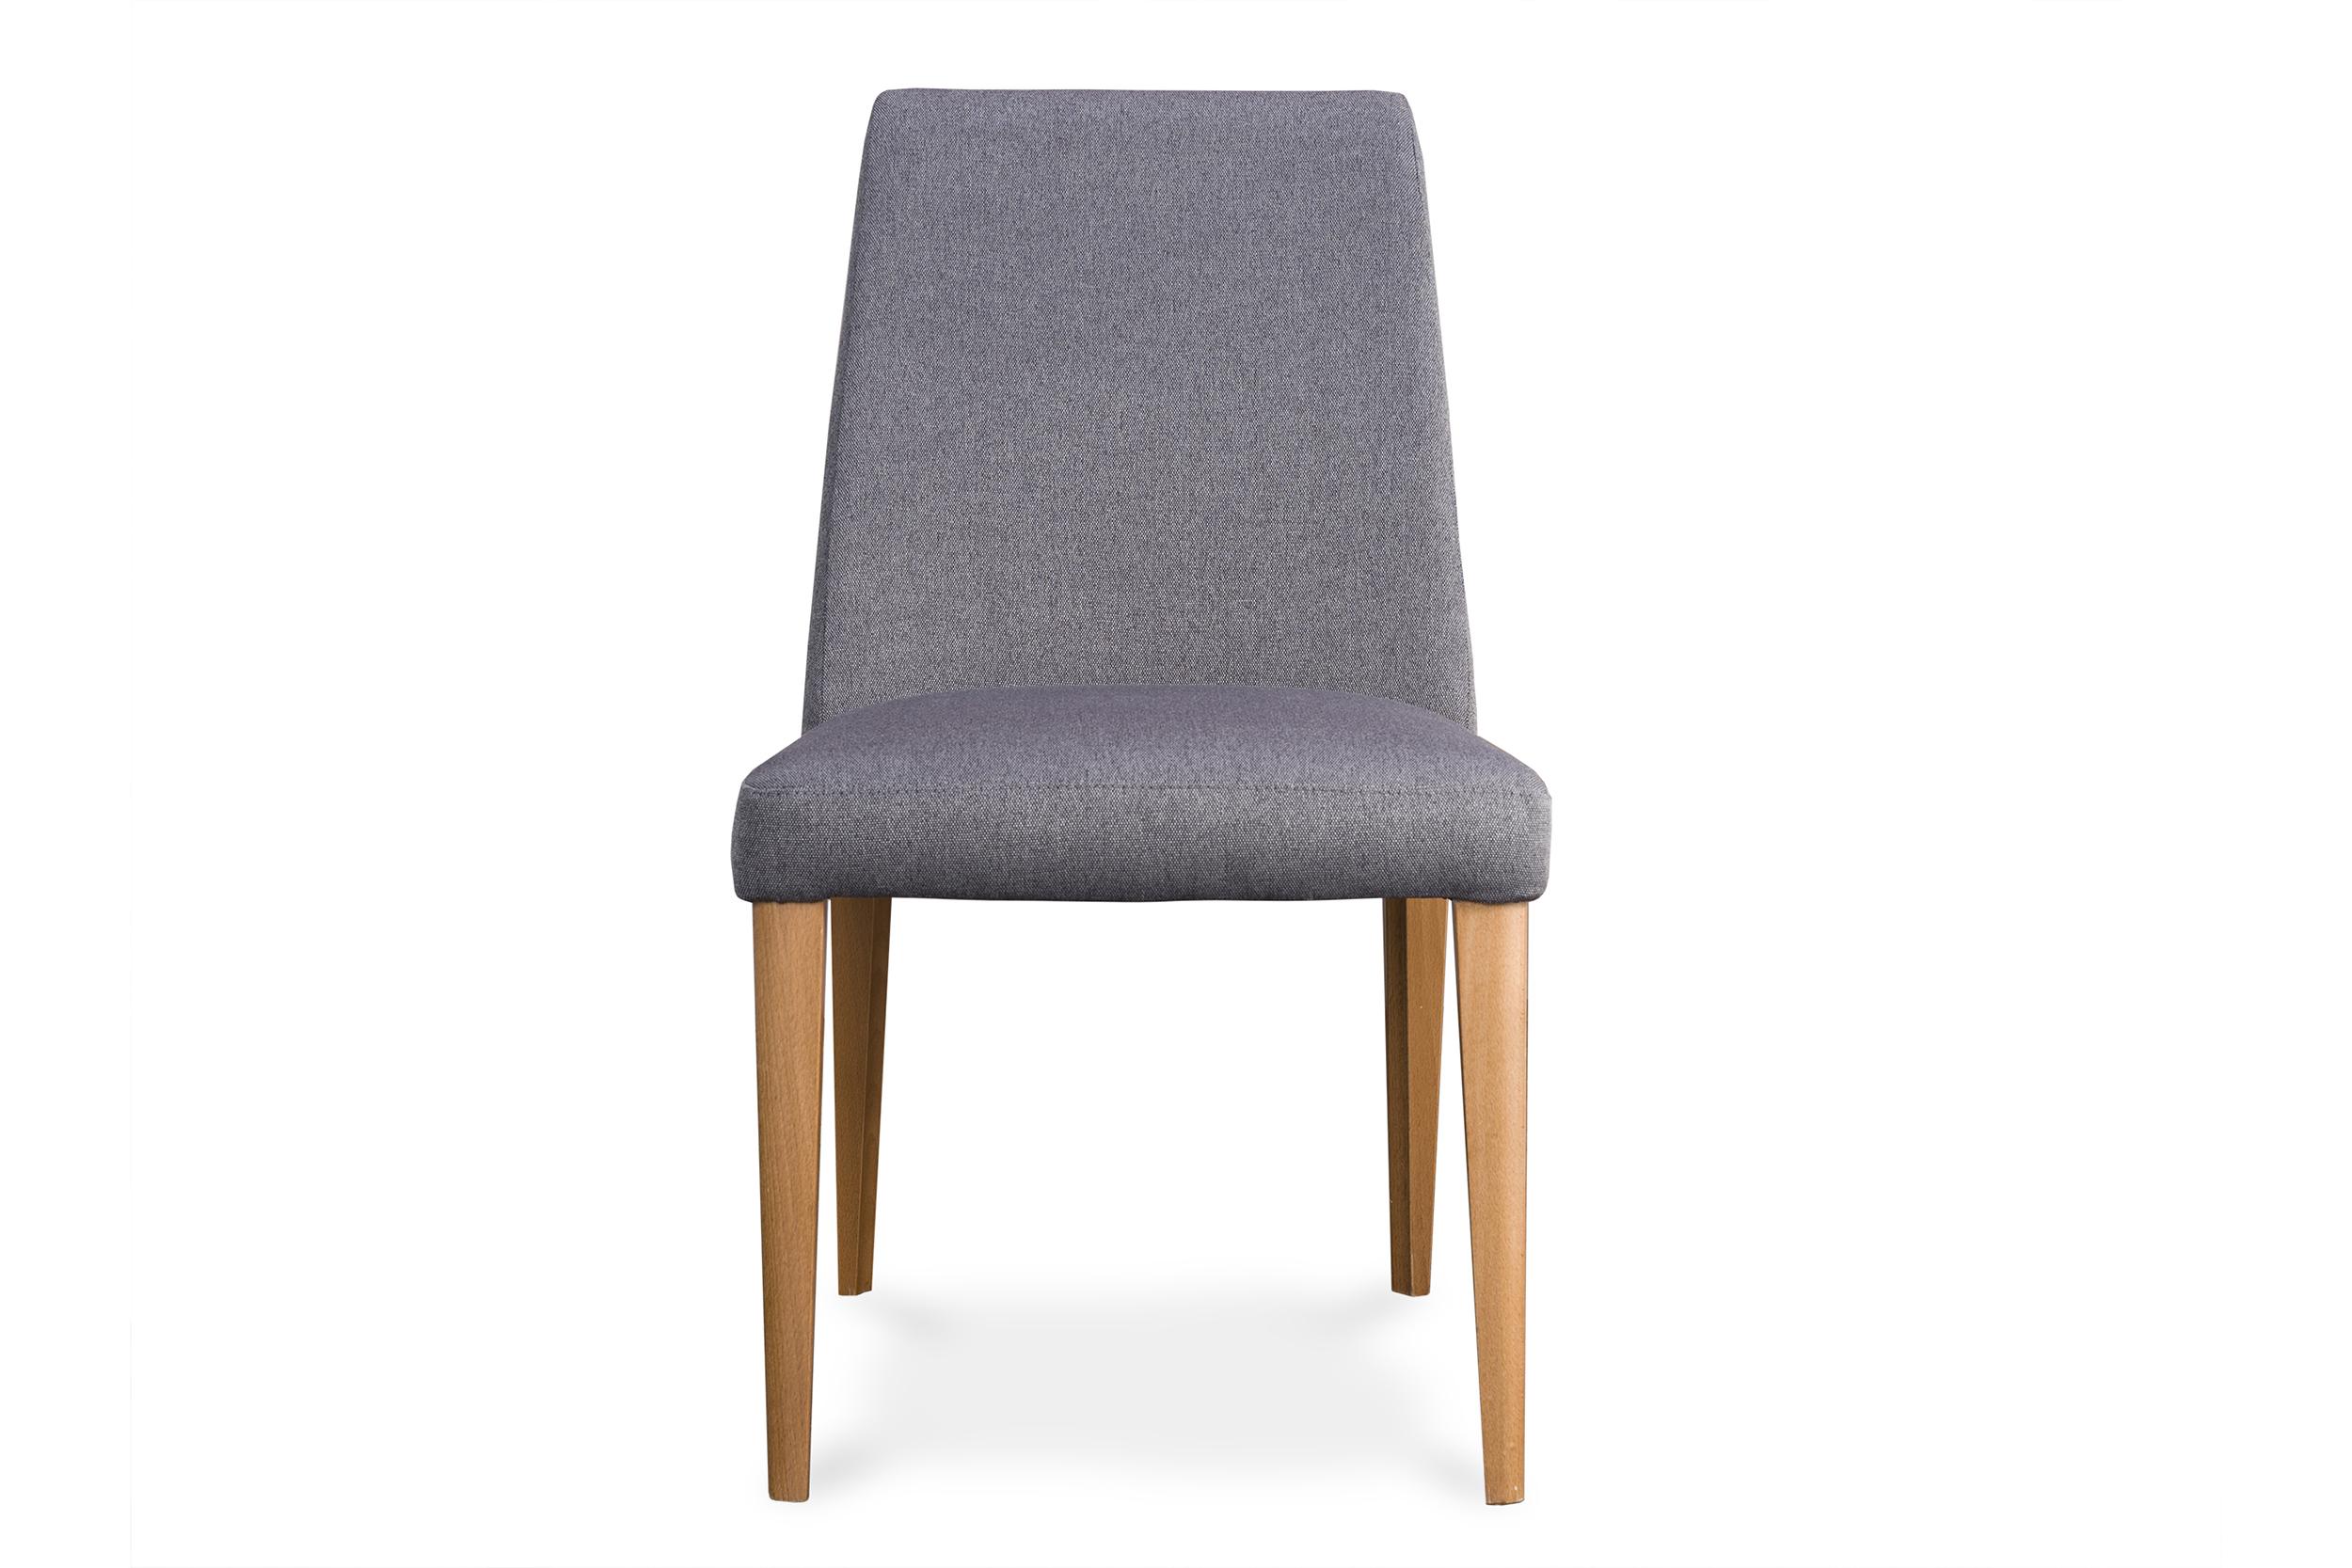 Кухонный стул MyFurnish 15445290 от thefurnish